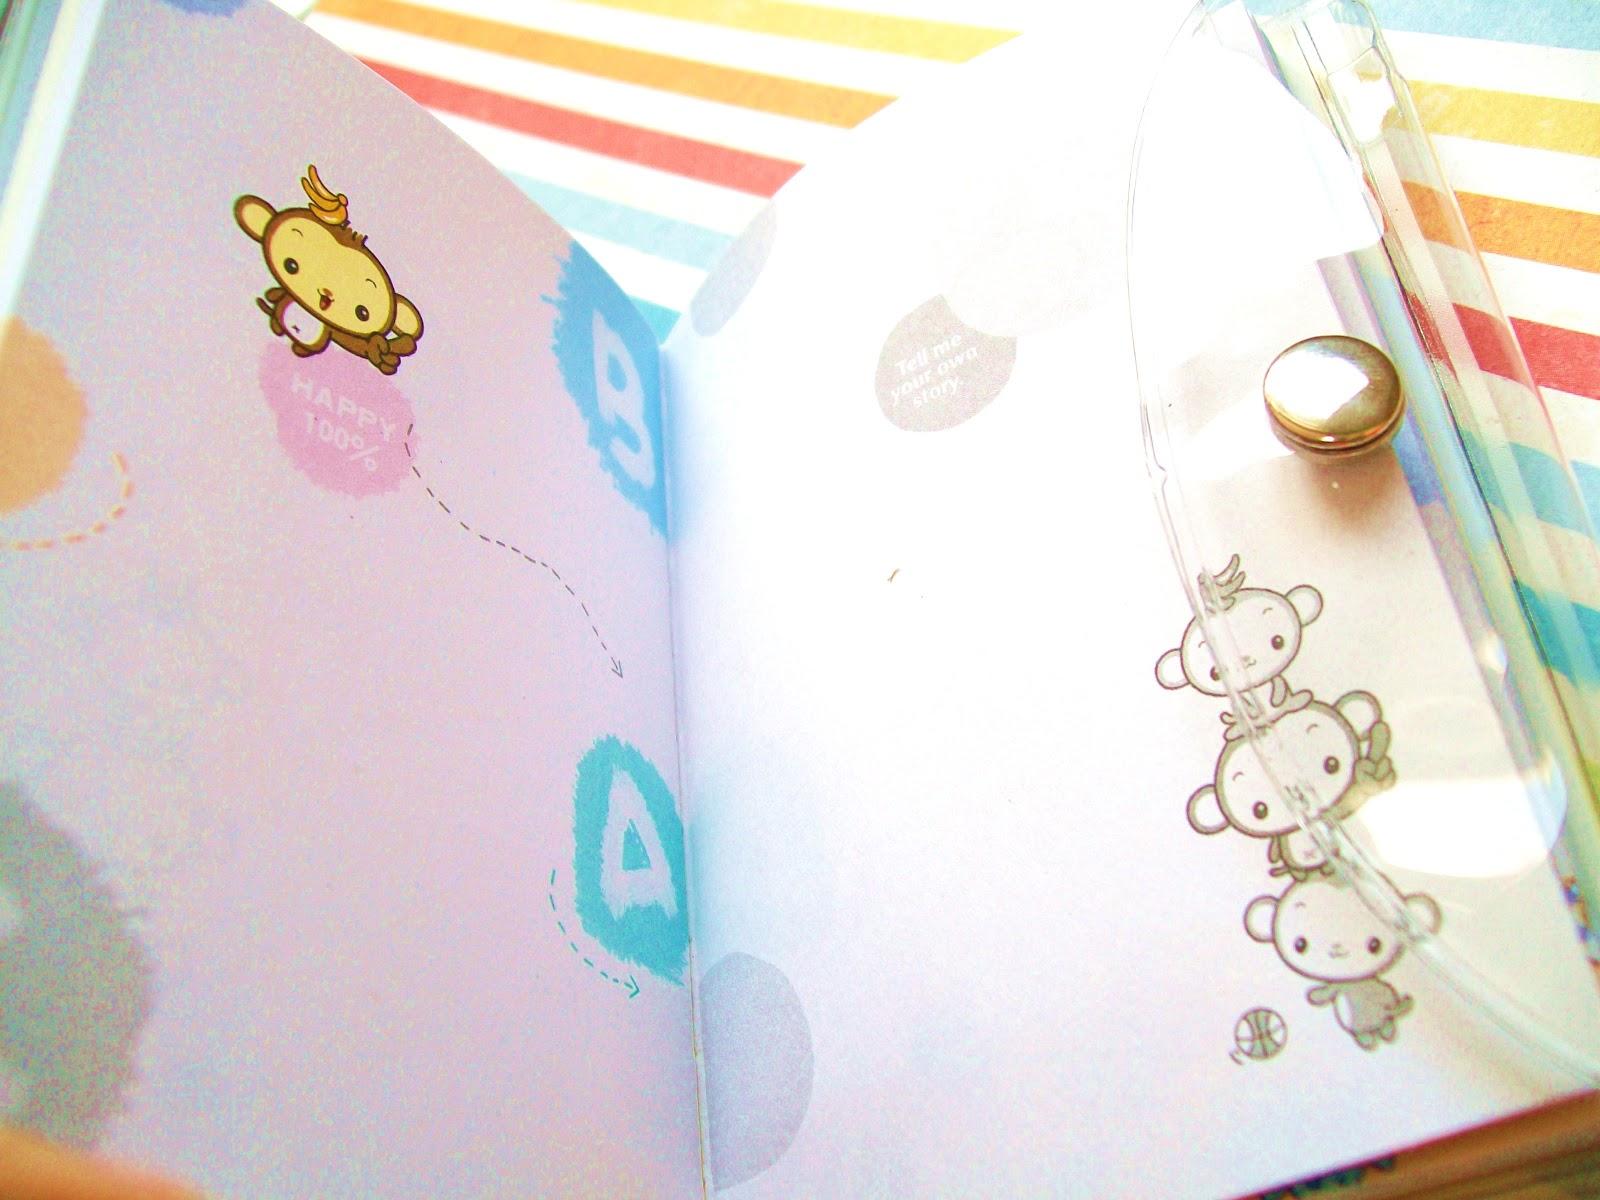 Libreta De Dibujo Con Dibujos Infant: {Lililandy}: LIBRETITA CON DIBUJOS KAWAII